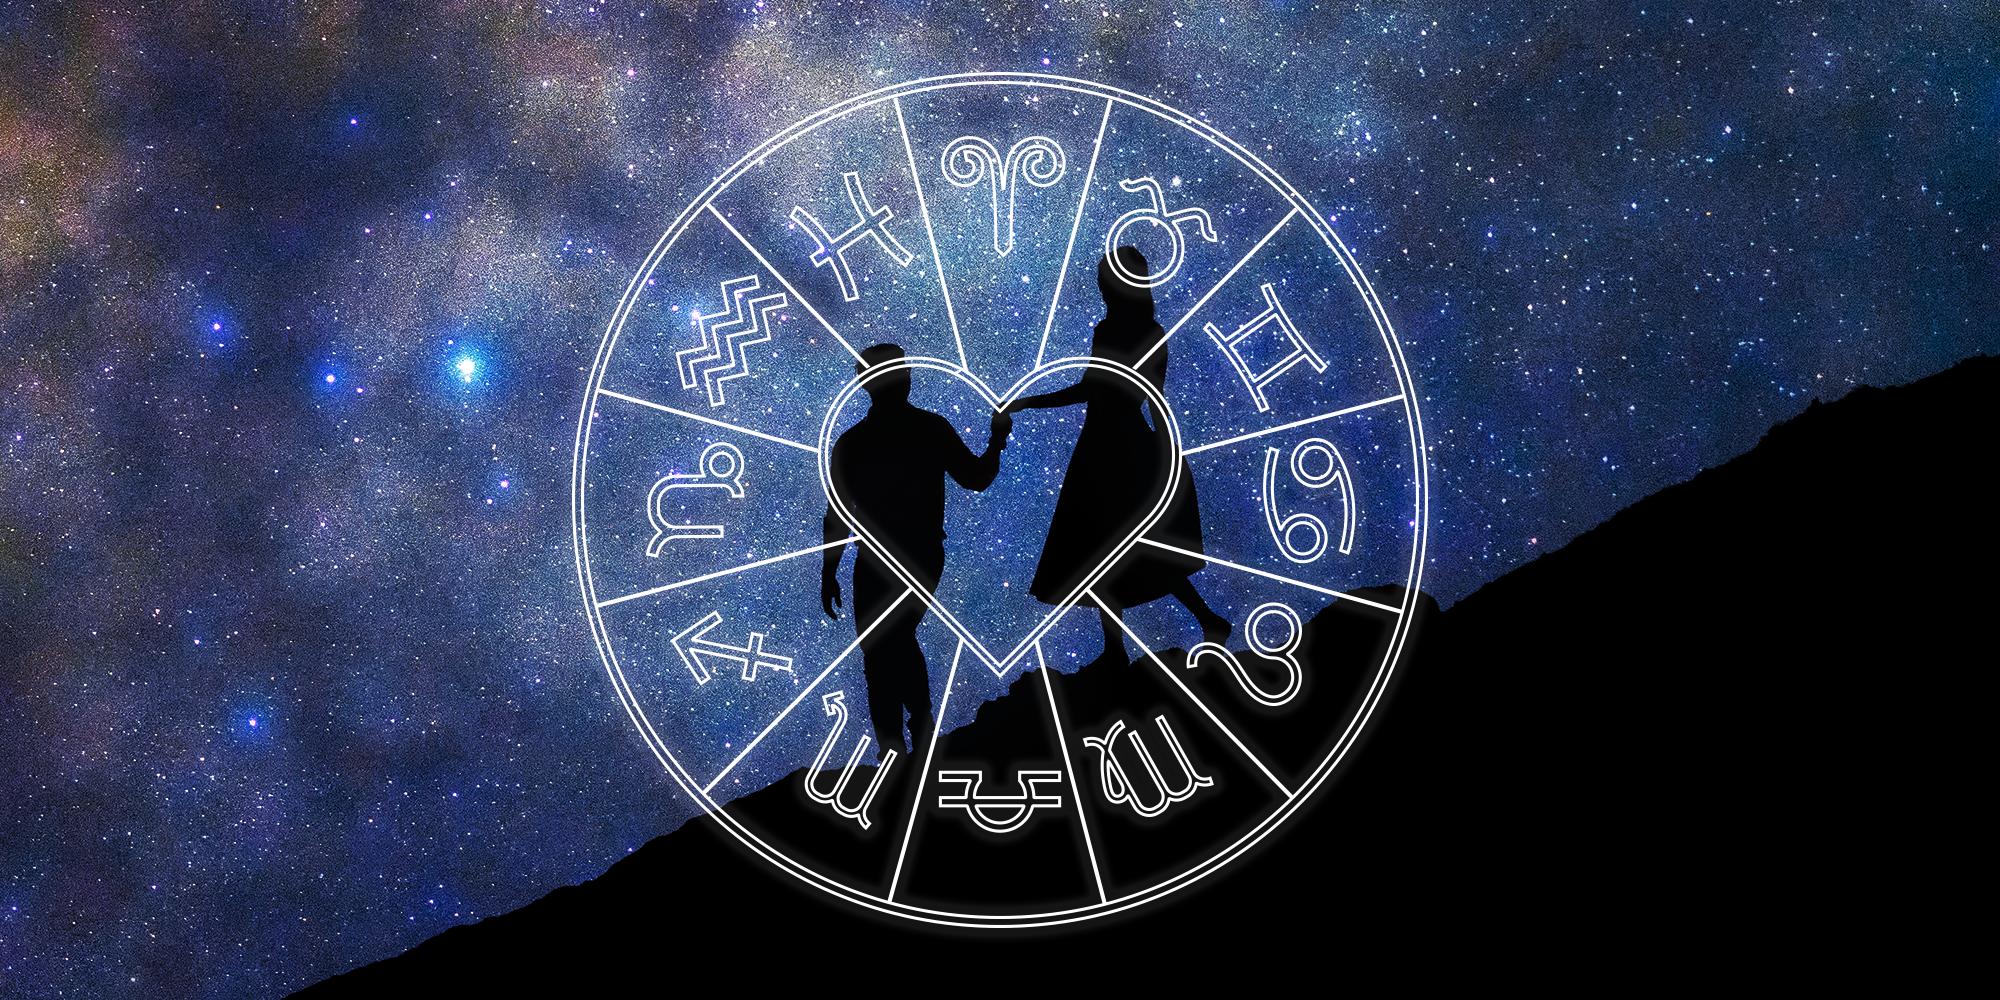 2019 Sex Horoscope Predictions, According To Zodiac Sign